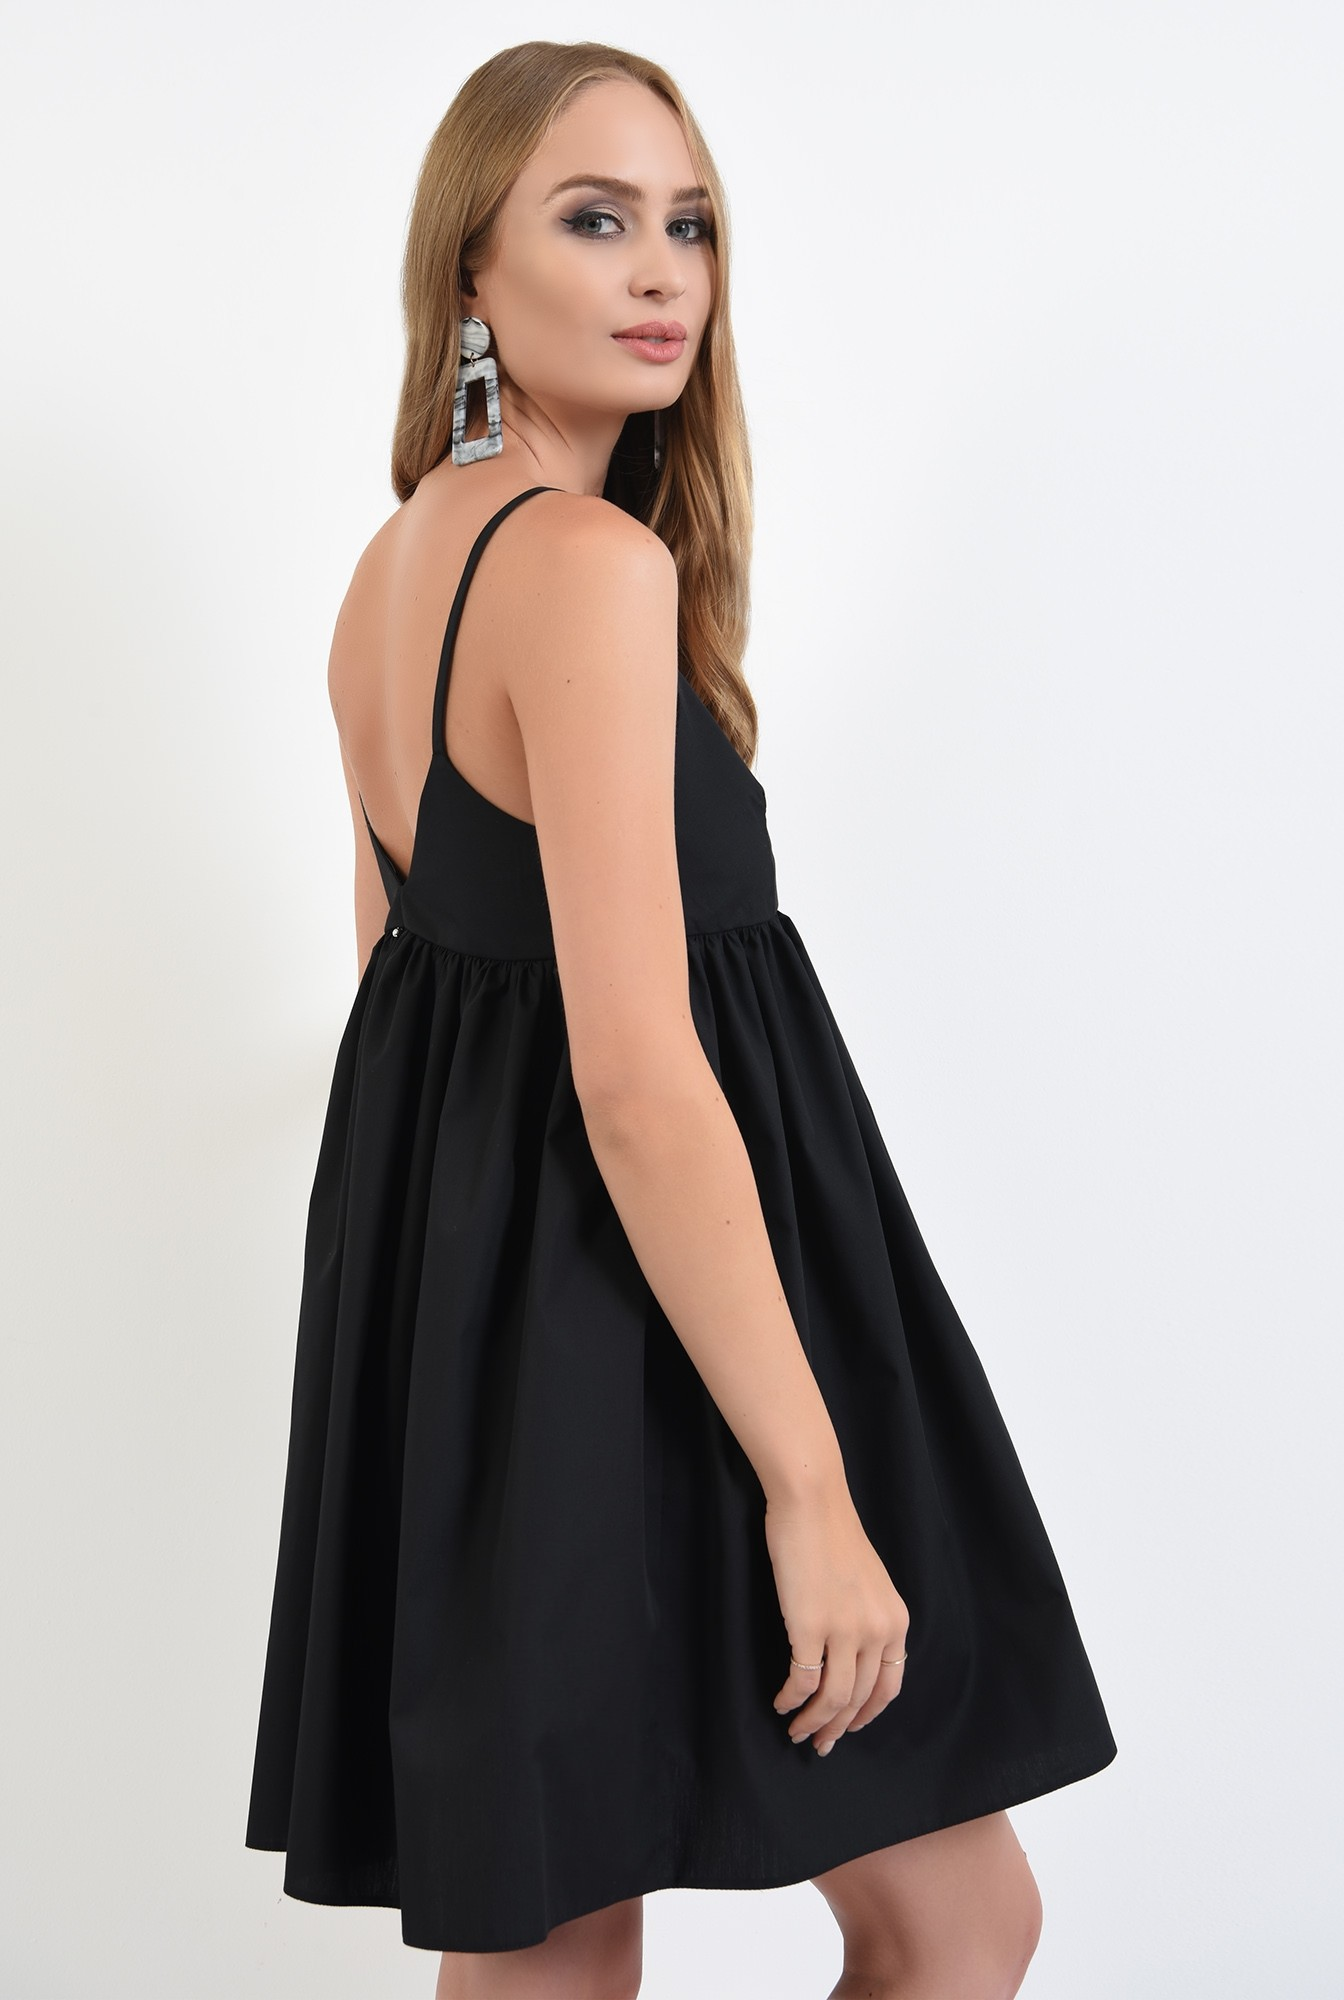 1 - 360 - rochie neagra, mini, evazata, cu bretele, anchior